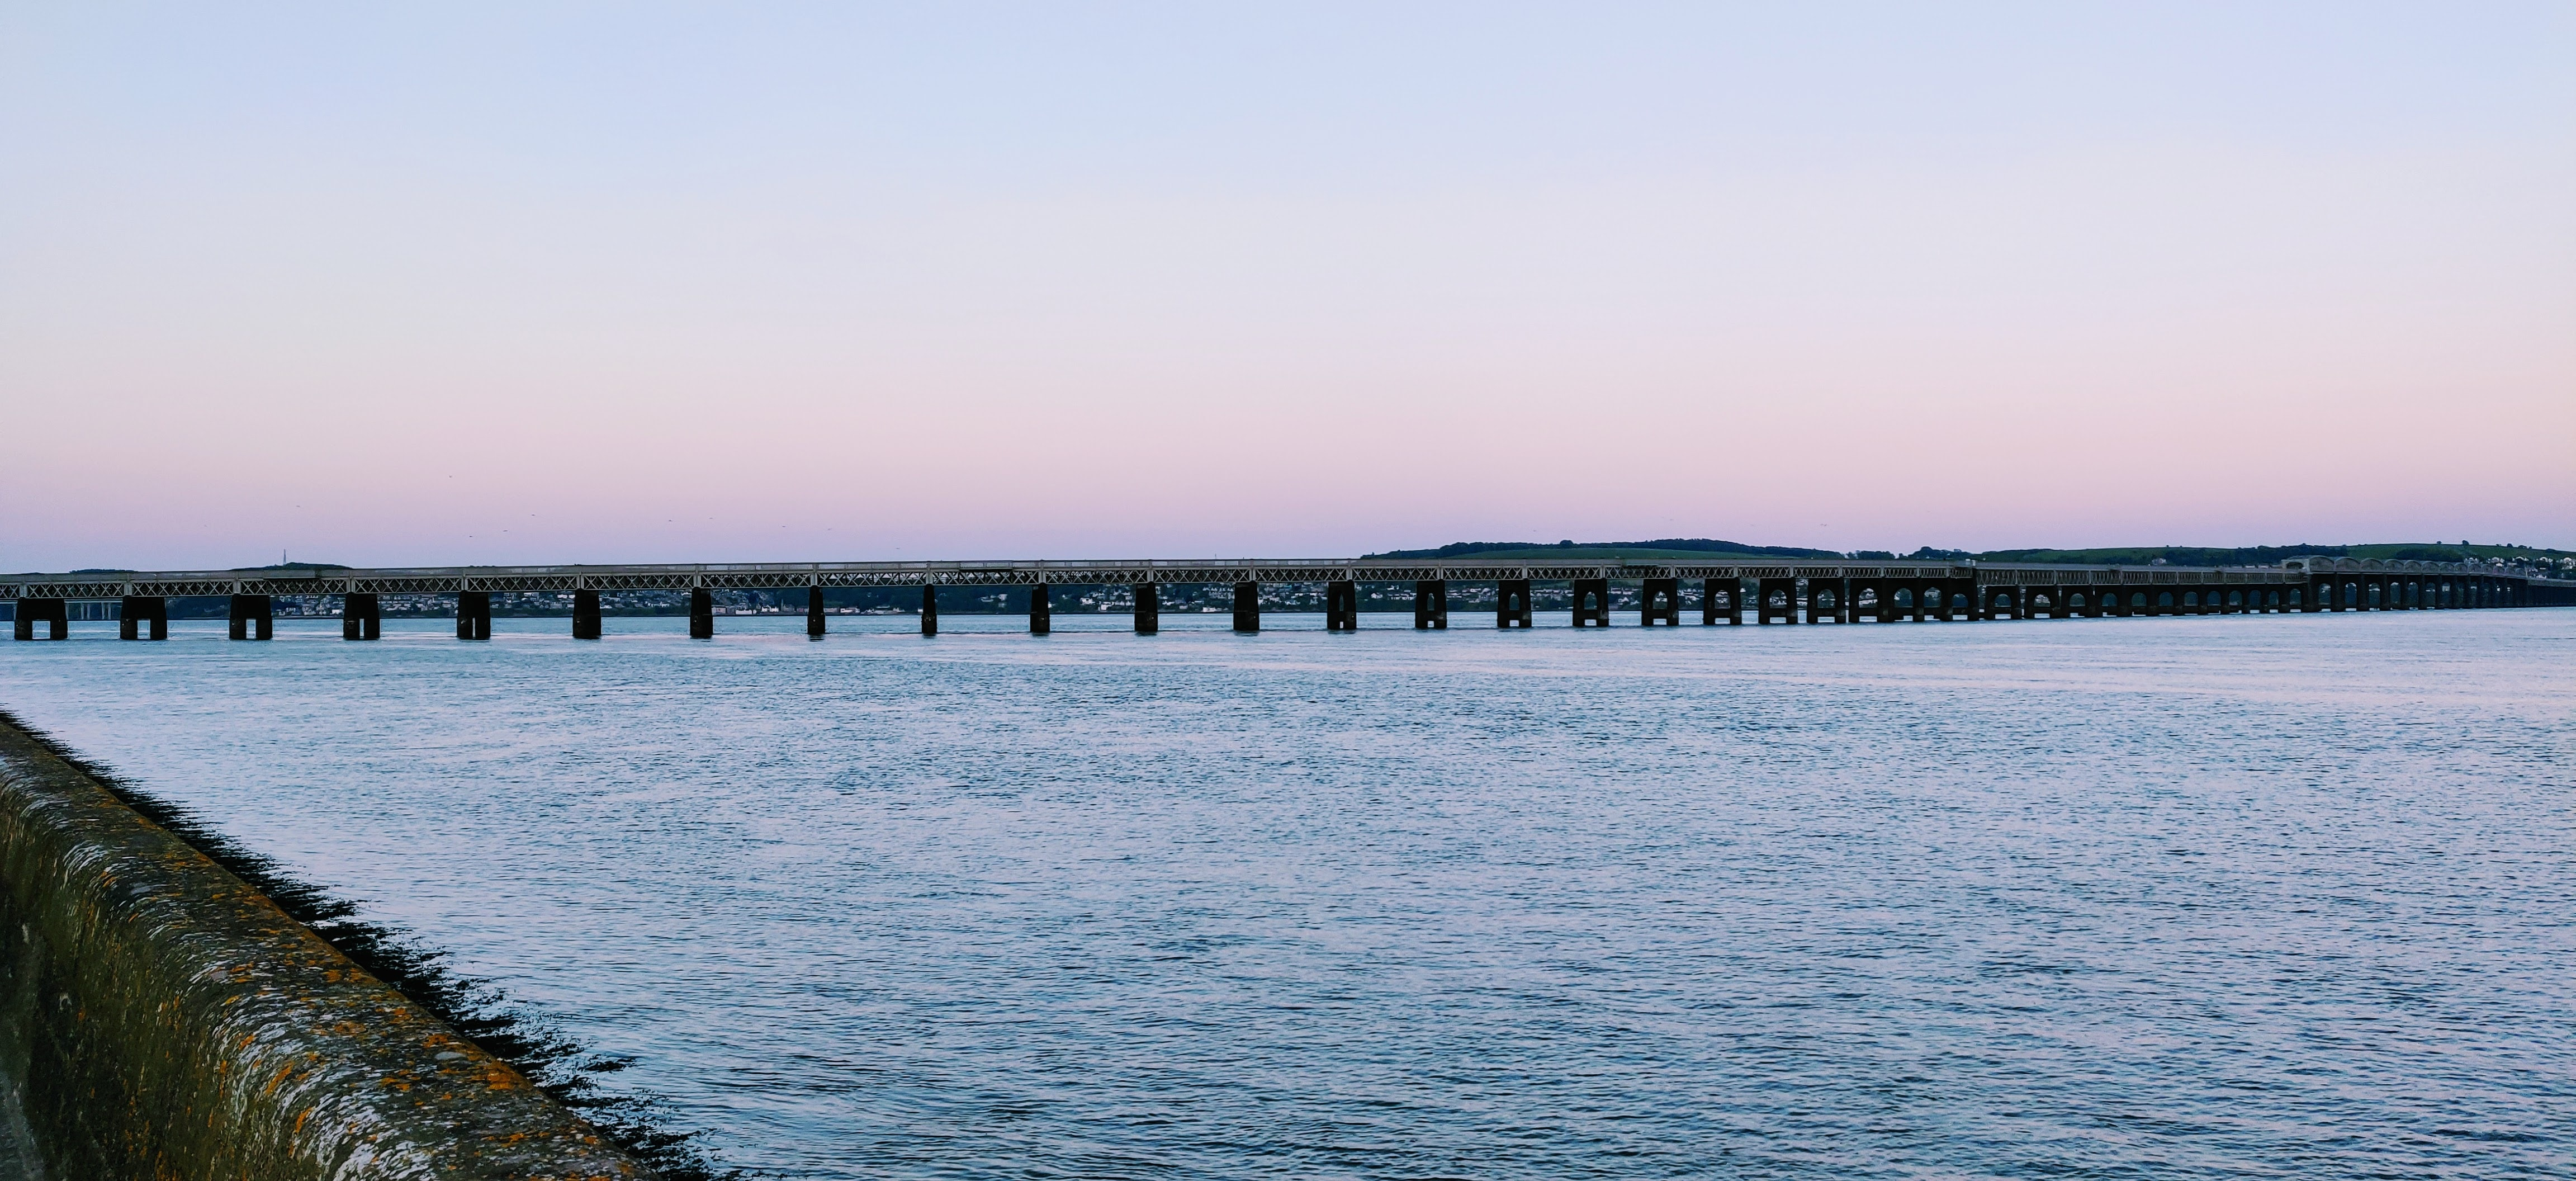 image of Tay Bridge